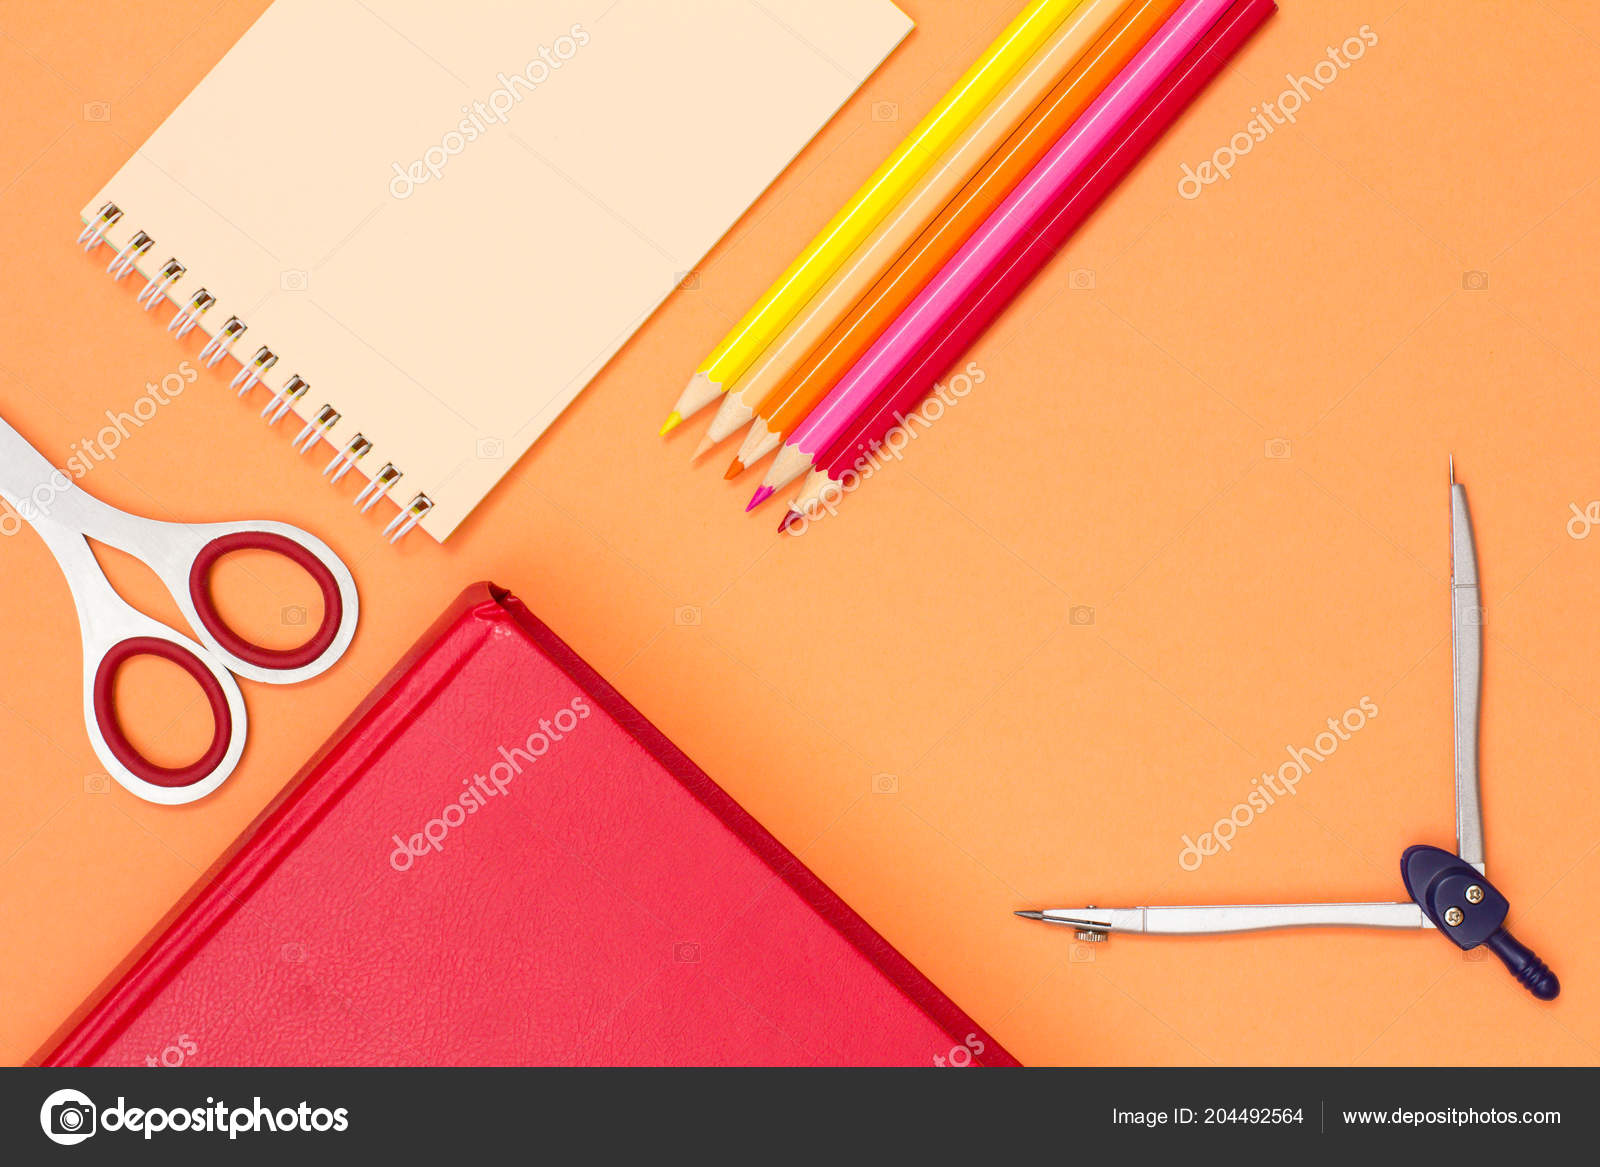 f10f7a9674a Βιβλίο, ψαλίδι, σημειωματάριο, μολύβια χρώματος και πυξίδα σε ροζ φόντο. Το  Top view. Πίσω στο σχολείο έννοια. Σχολικά είδη. Παστέλ χρώματα — Εικόνα  από ...